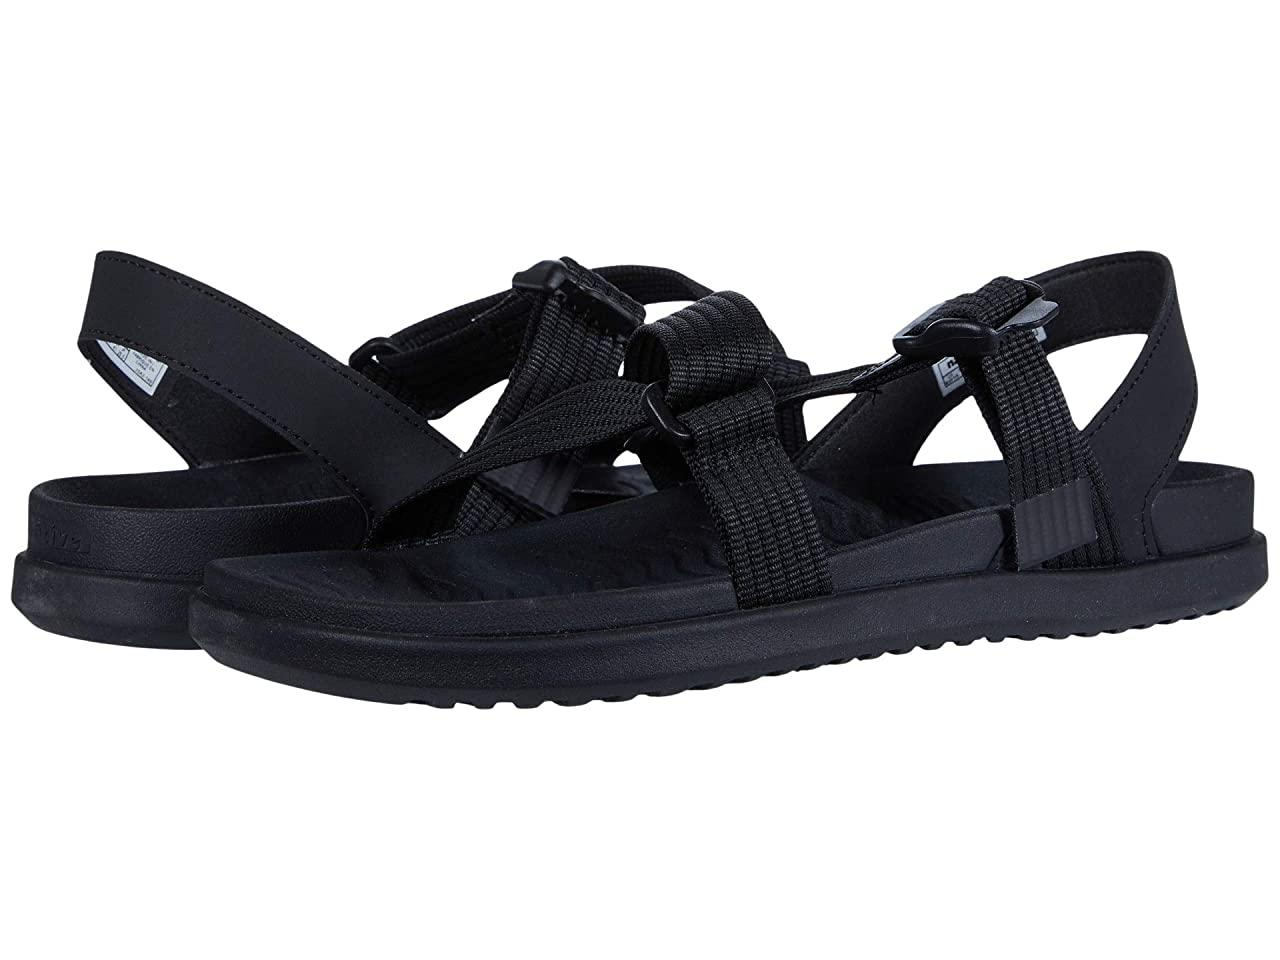 Сандали/Вьетнамки (Оригинал) Native Shoes Zurich Jiffy Black/Jiffy Black